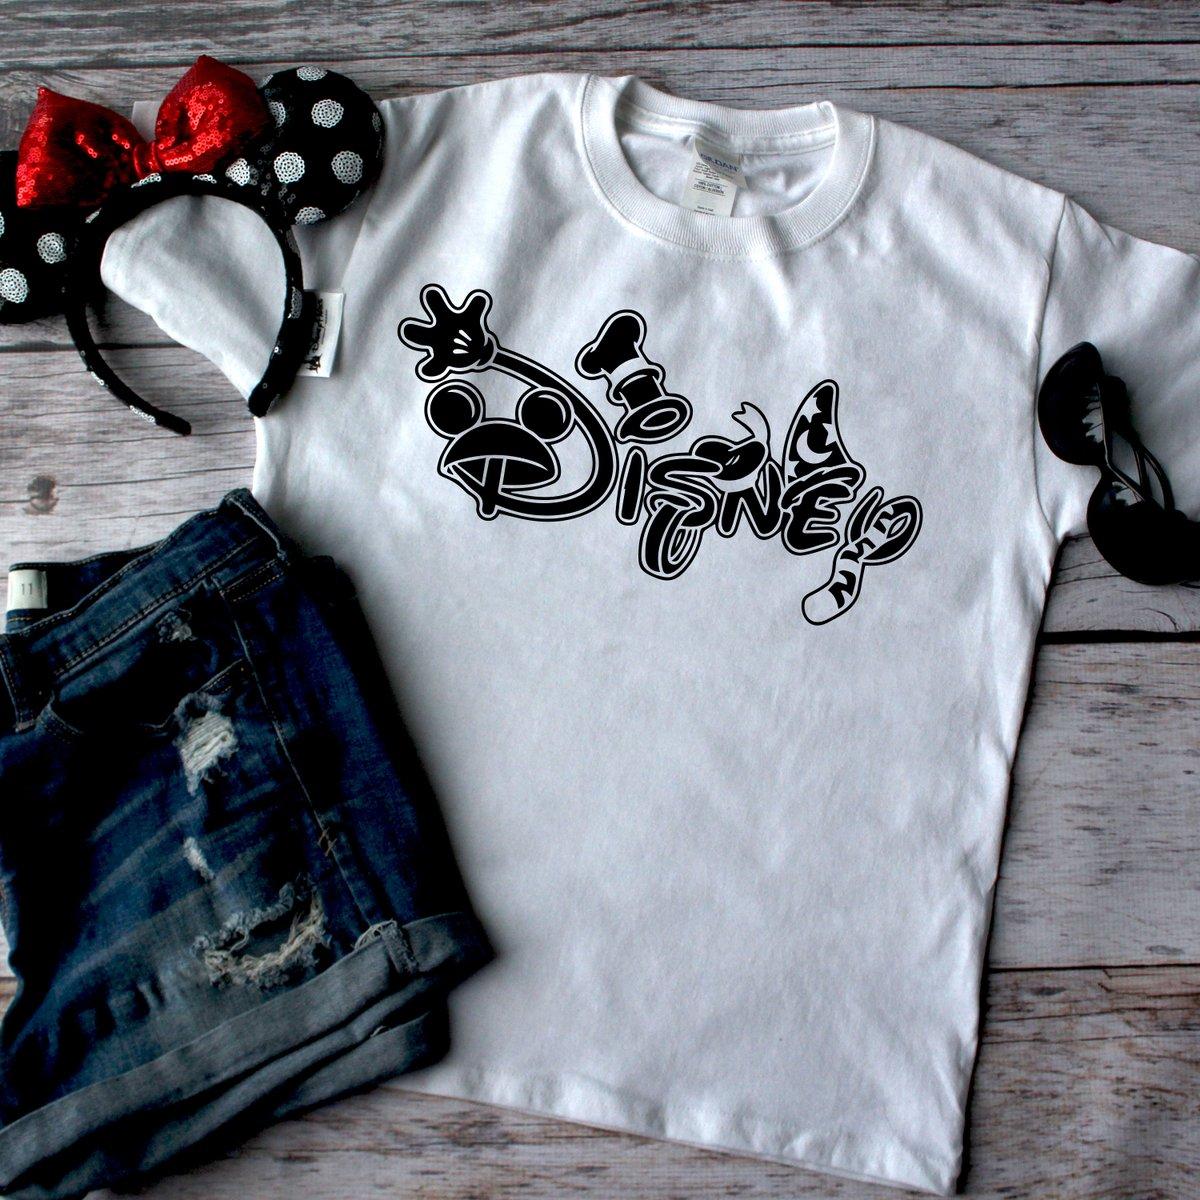 Family vacation shirt,Disney shirt,Disney Vacation Shirt,Mickey Vacation shirt,Matching shirts,Matching vacation shirt  #disneyears #toystoryforkyears